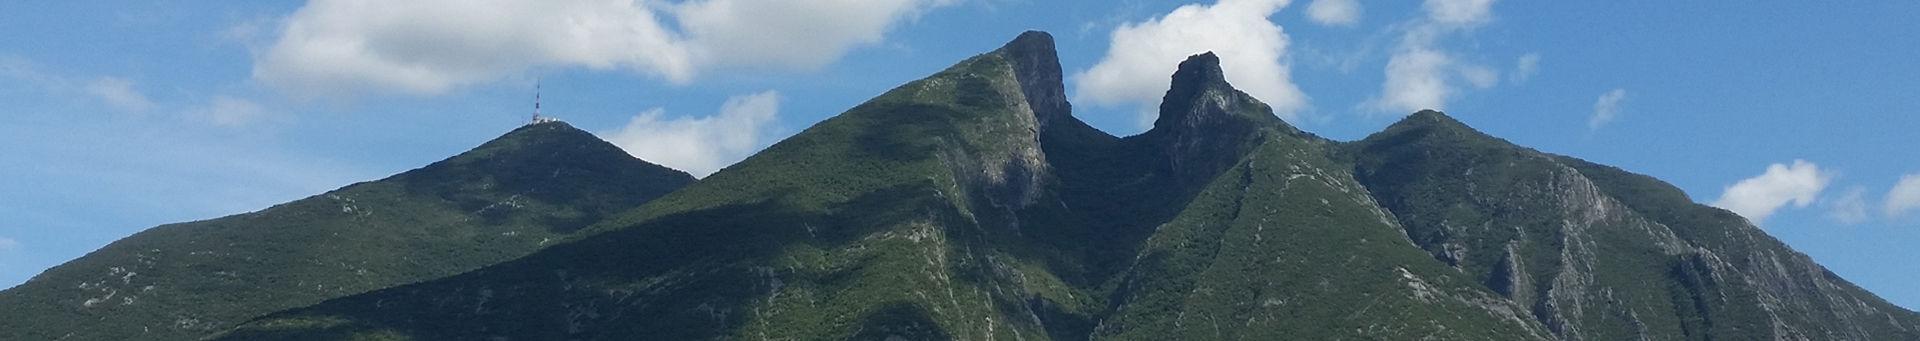 Cerro de la Silla 01 -